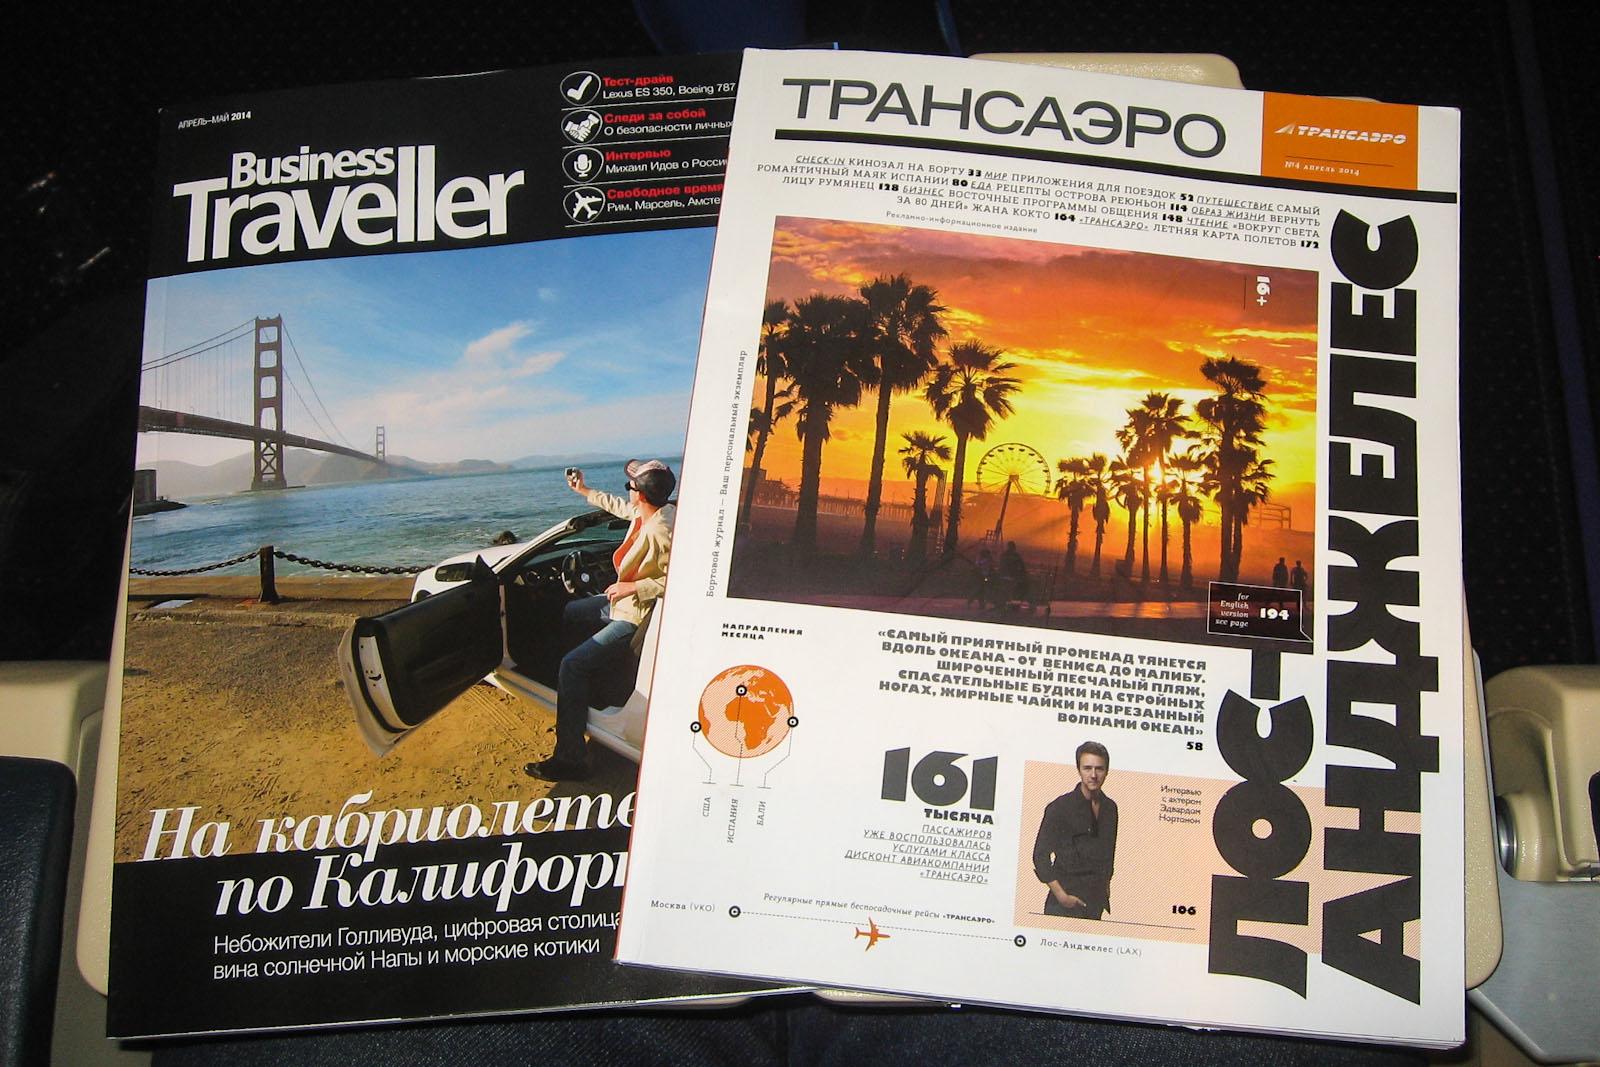 Журналы для пассажиров Трансаэро